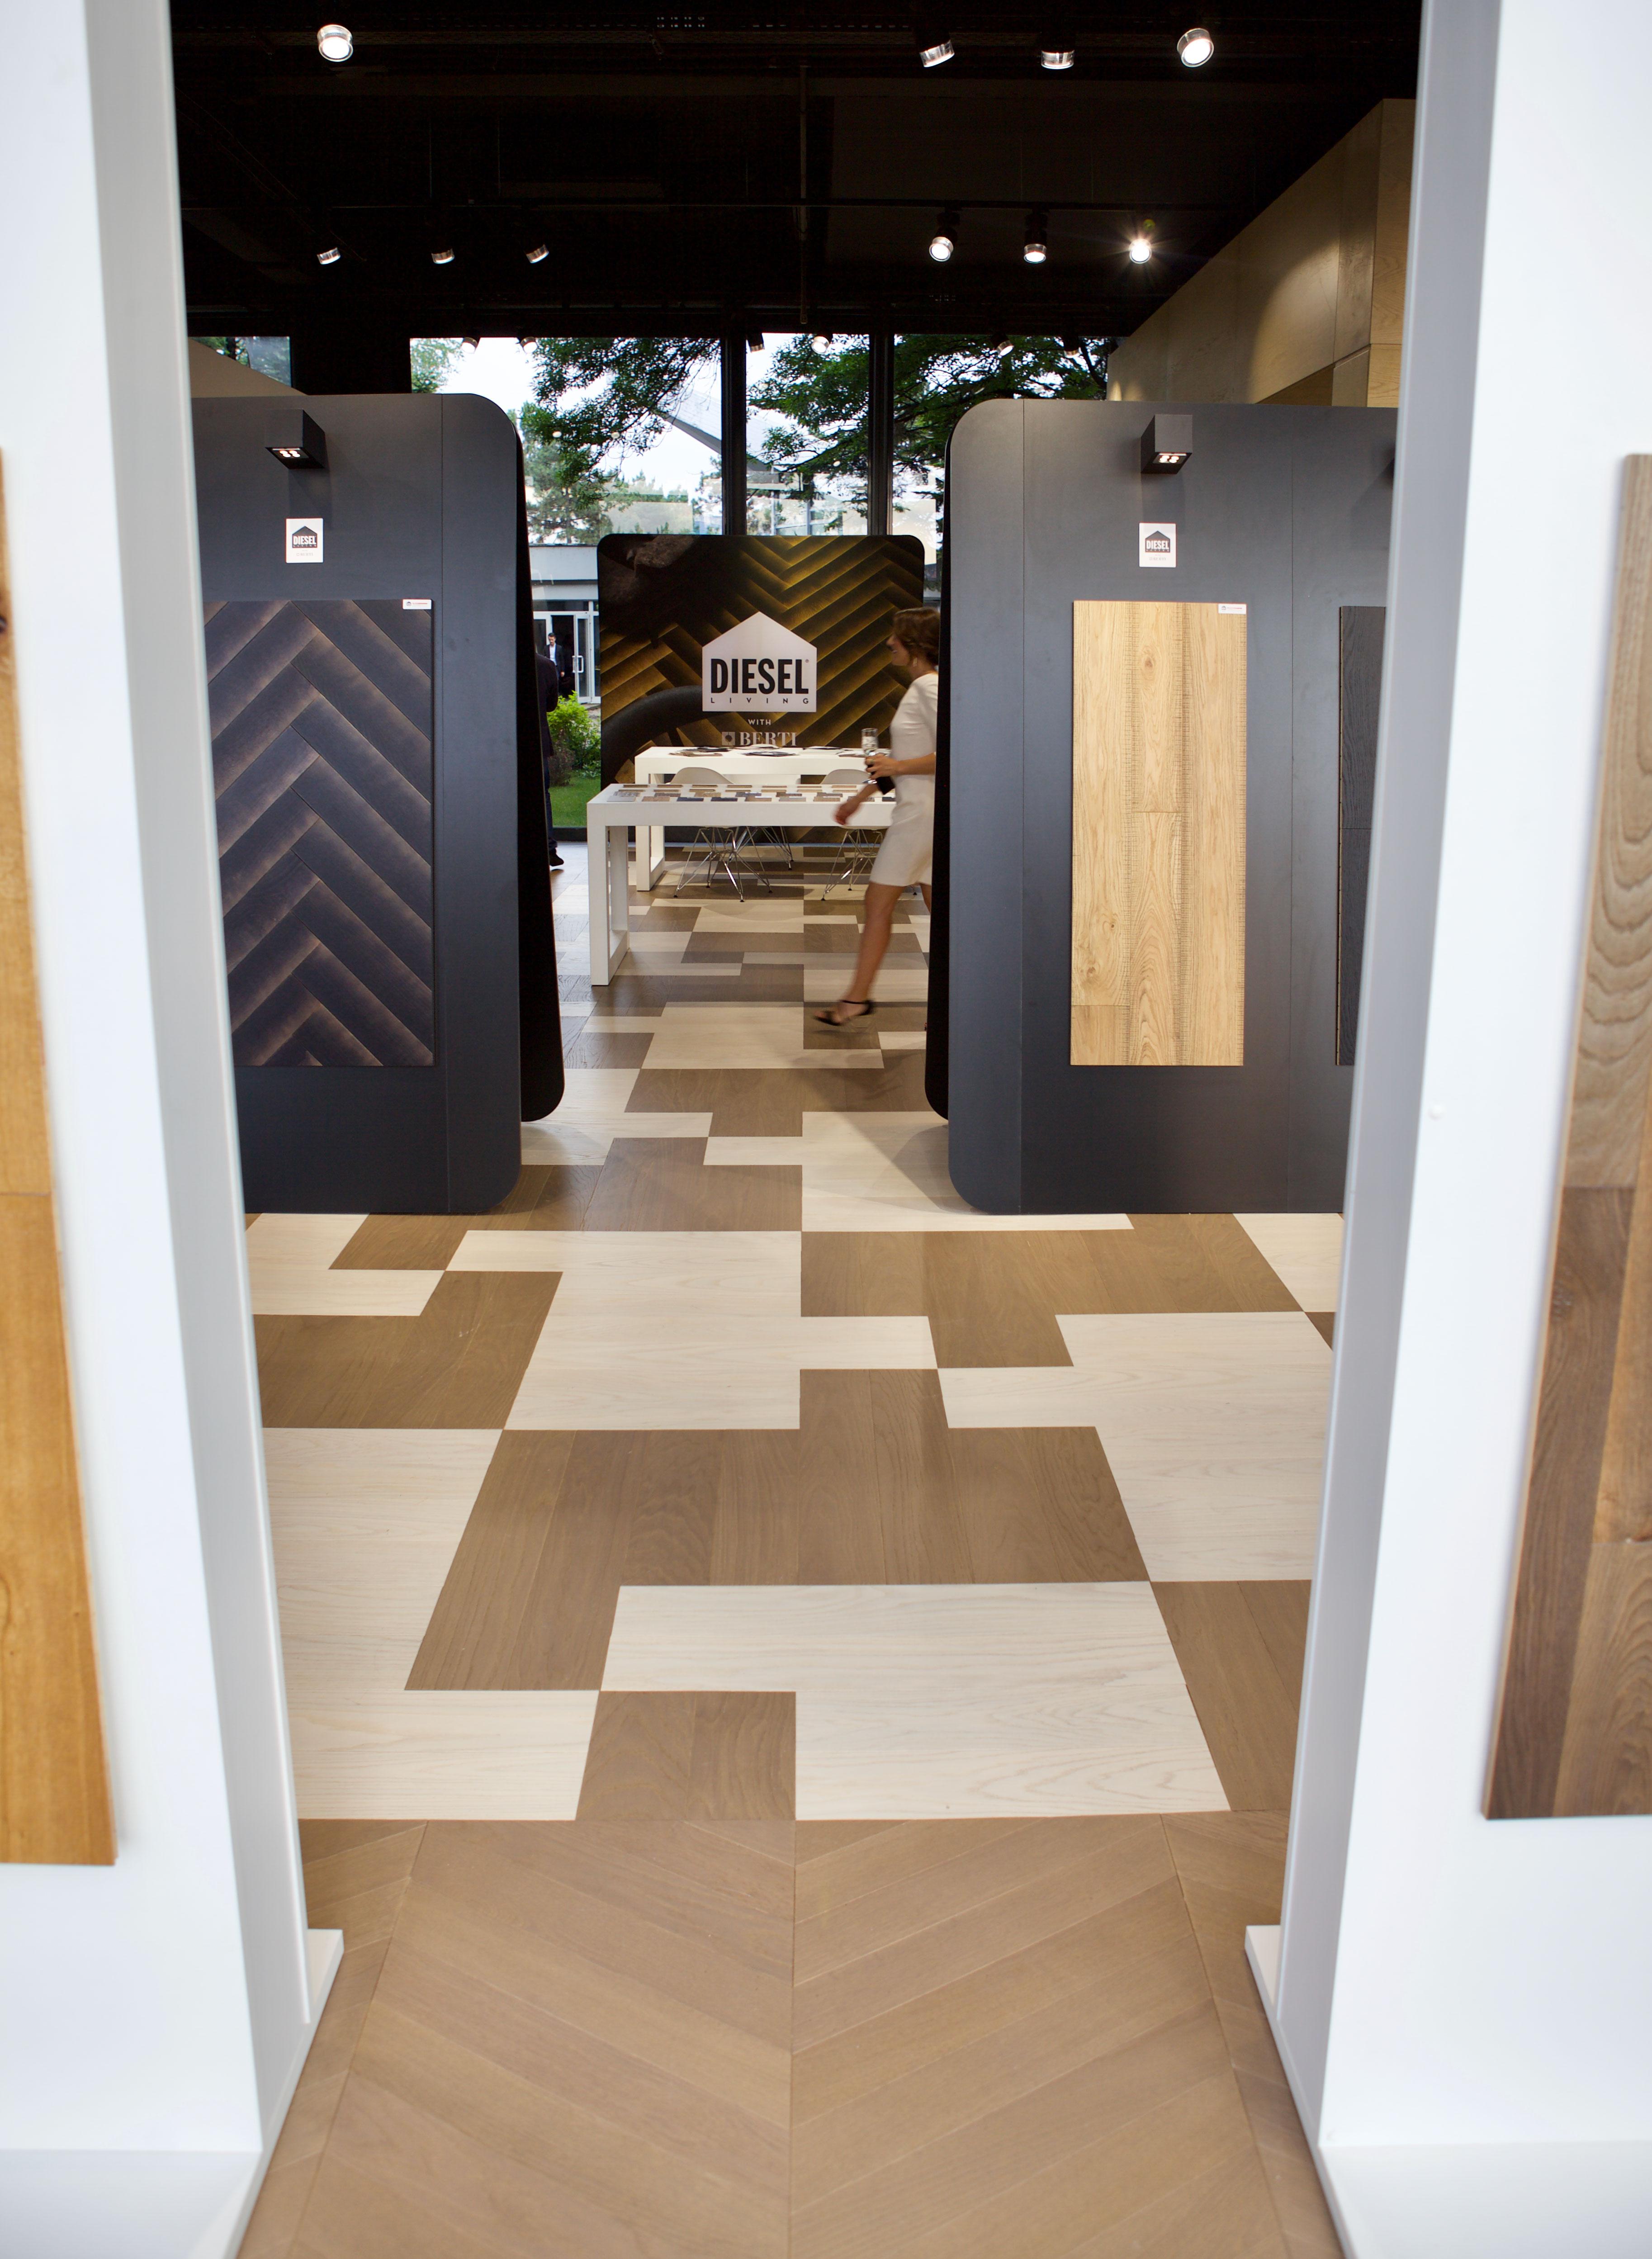 Berti-wooden-floors-@25th-Anniversary-Pinum----16